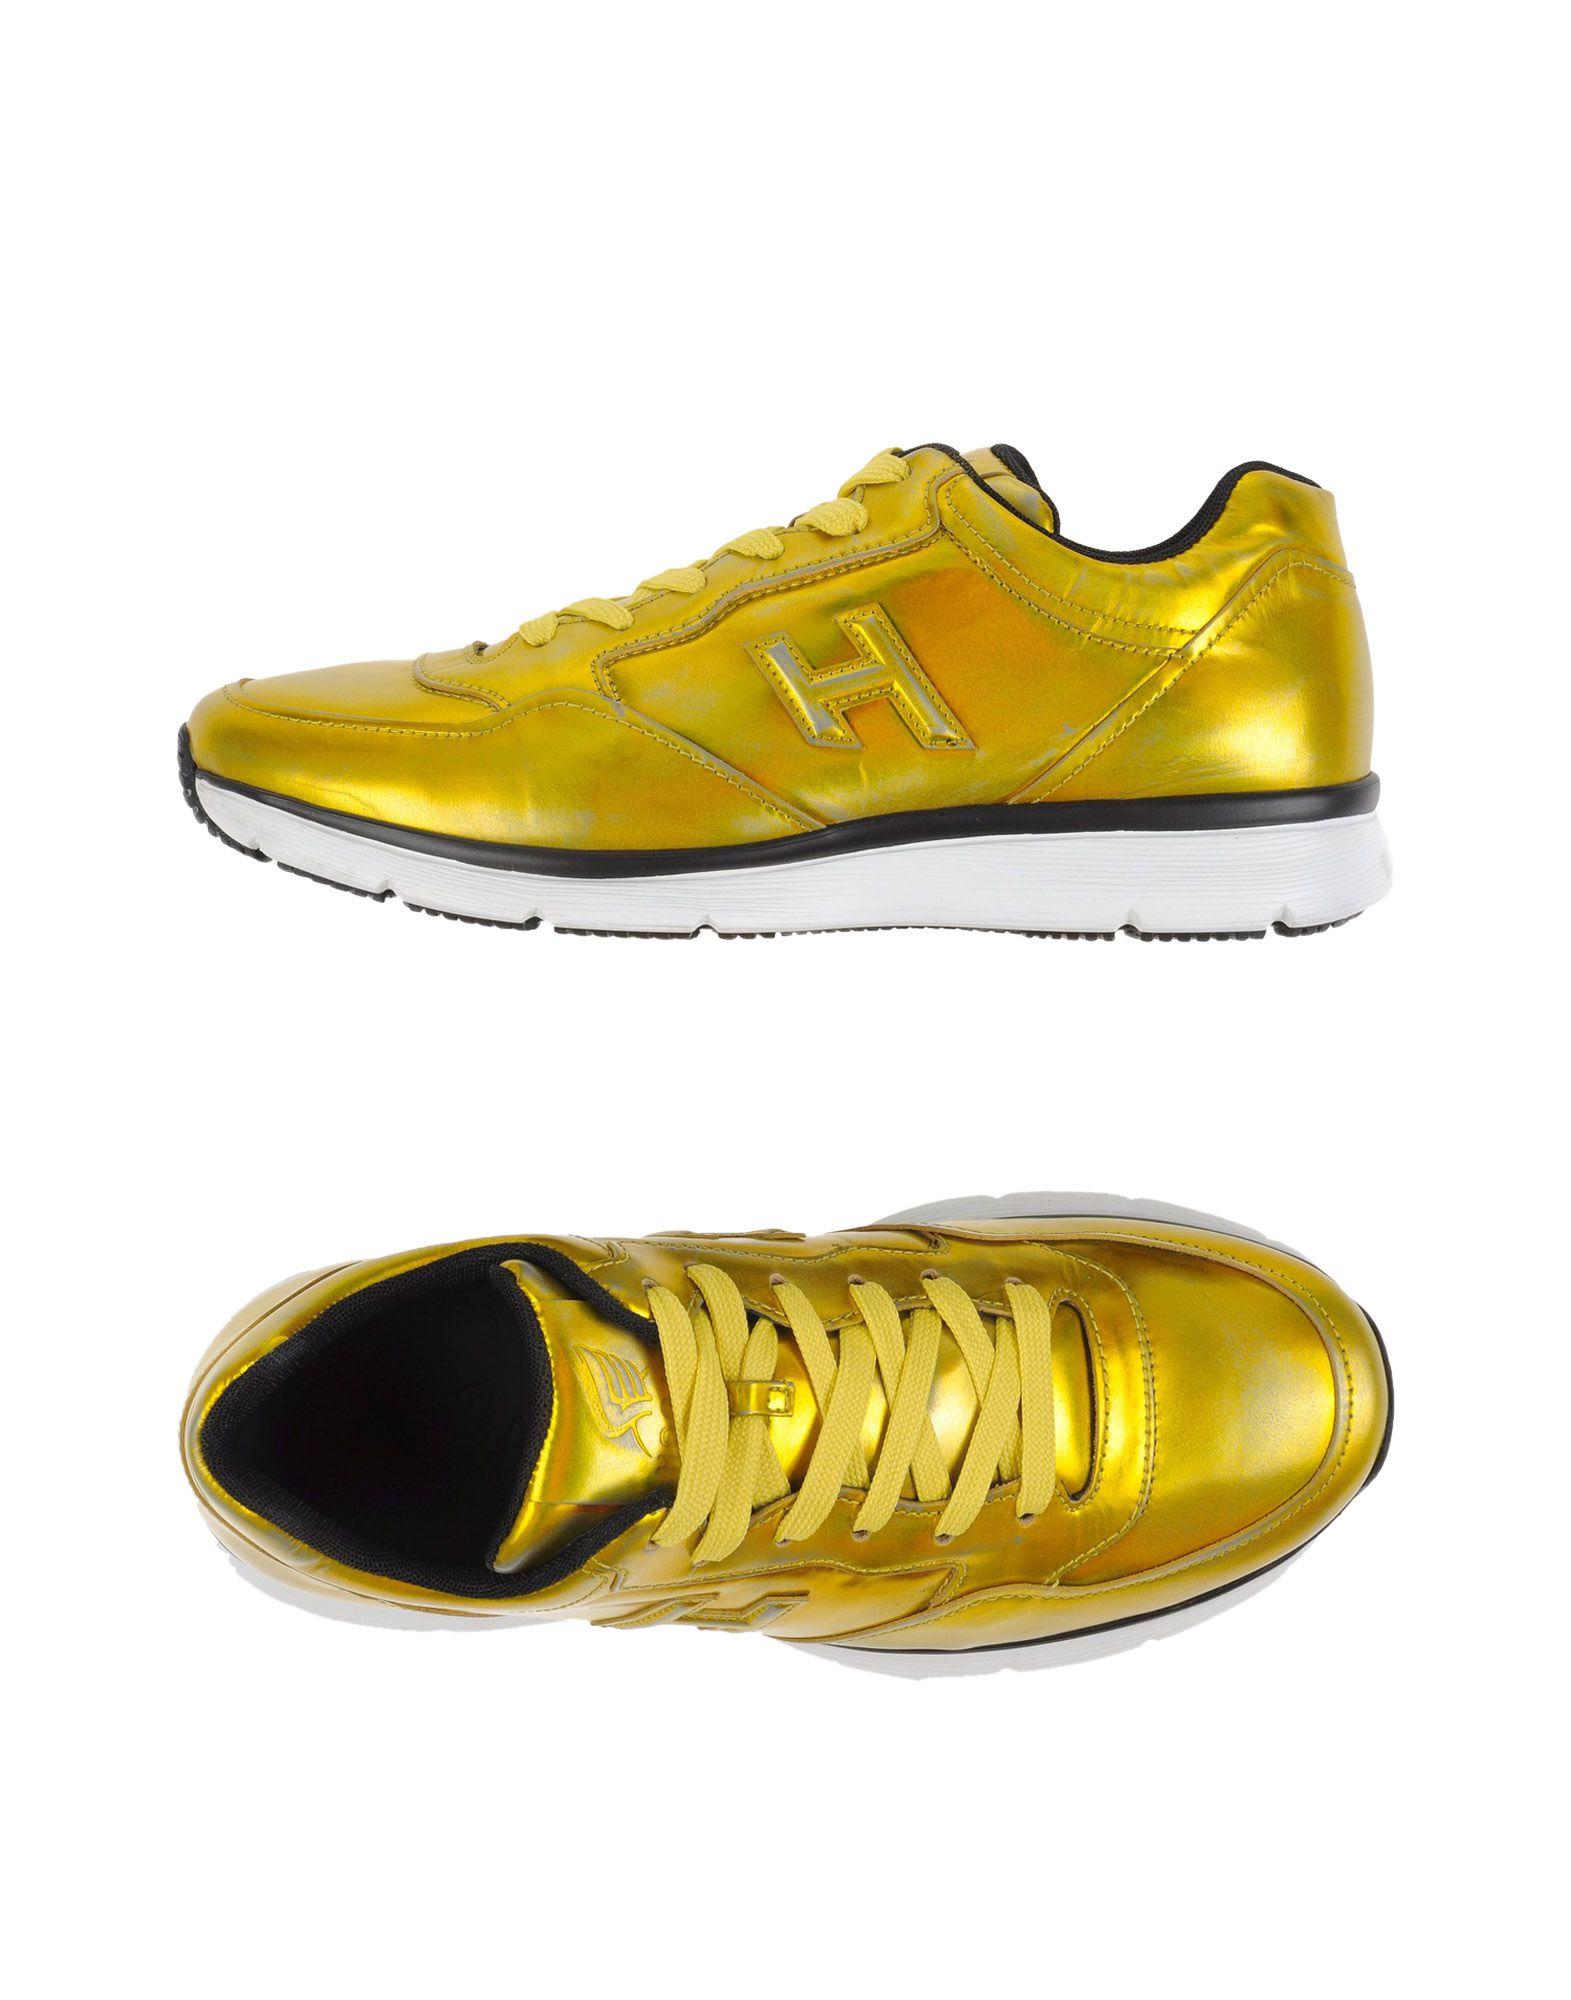 Hogan Sneakers Herren  11177125QE Gute Qualität beliebte Schuhe